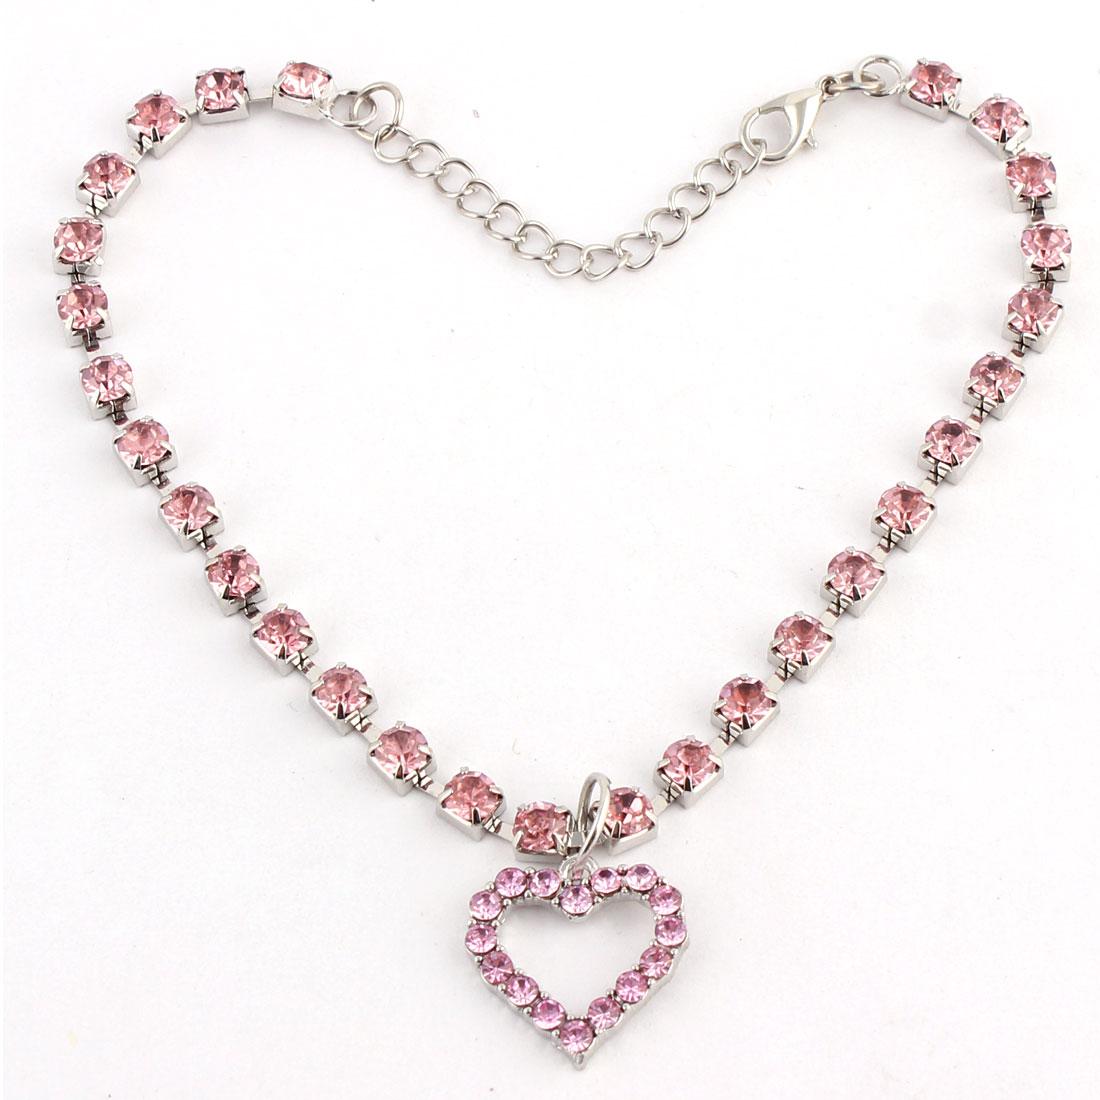 Dog Metal Beads Linked Rhinestone Inlaid Heart Shaped Pendant Necklace Pink